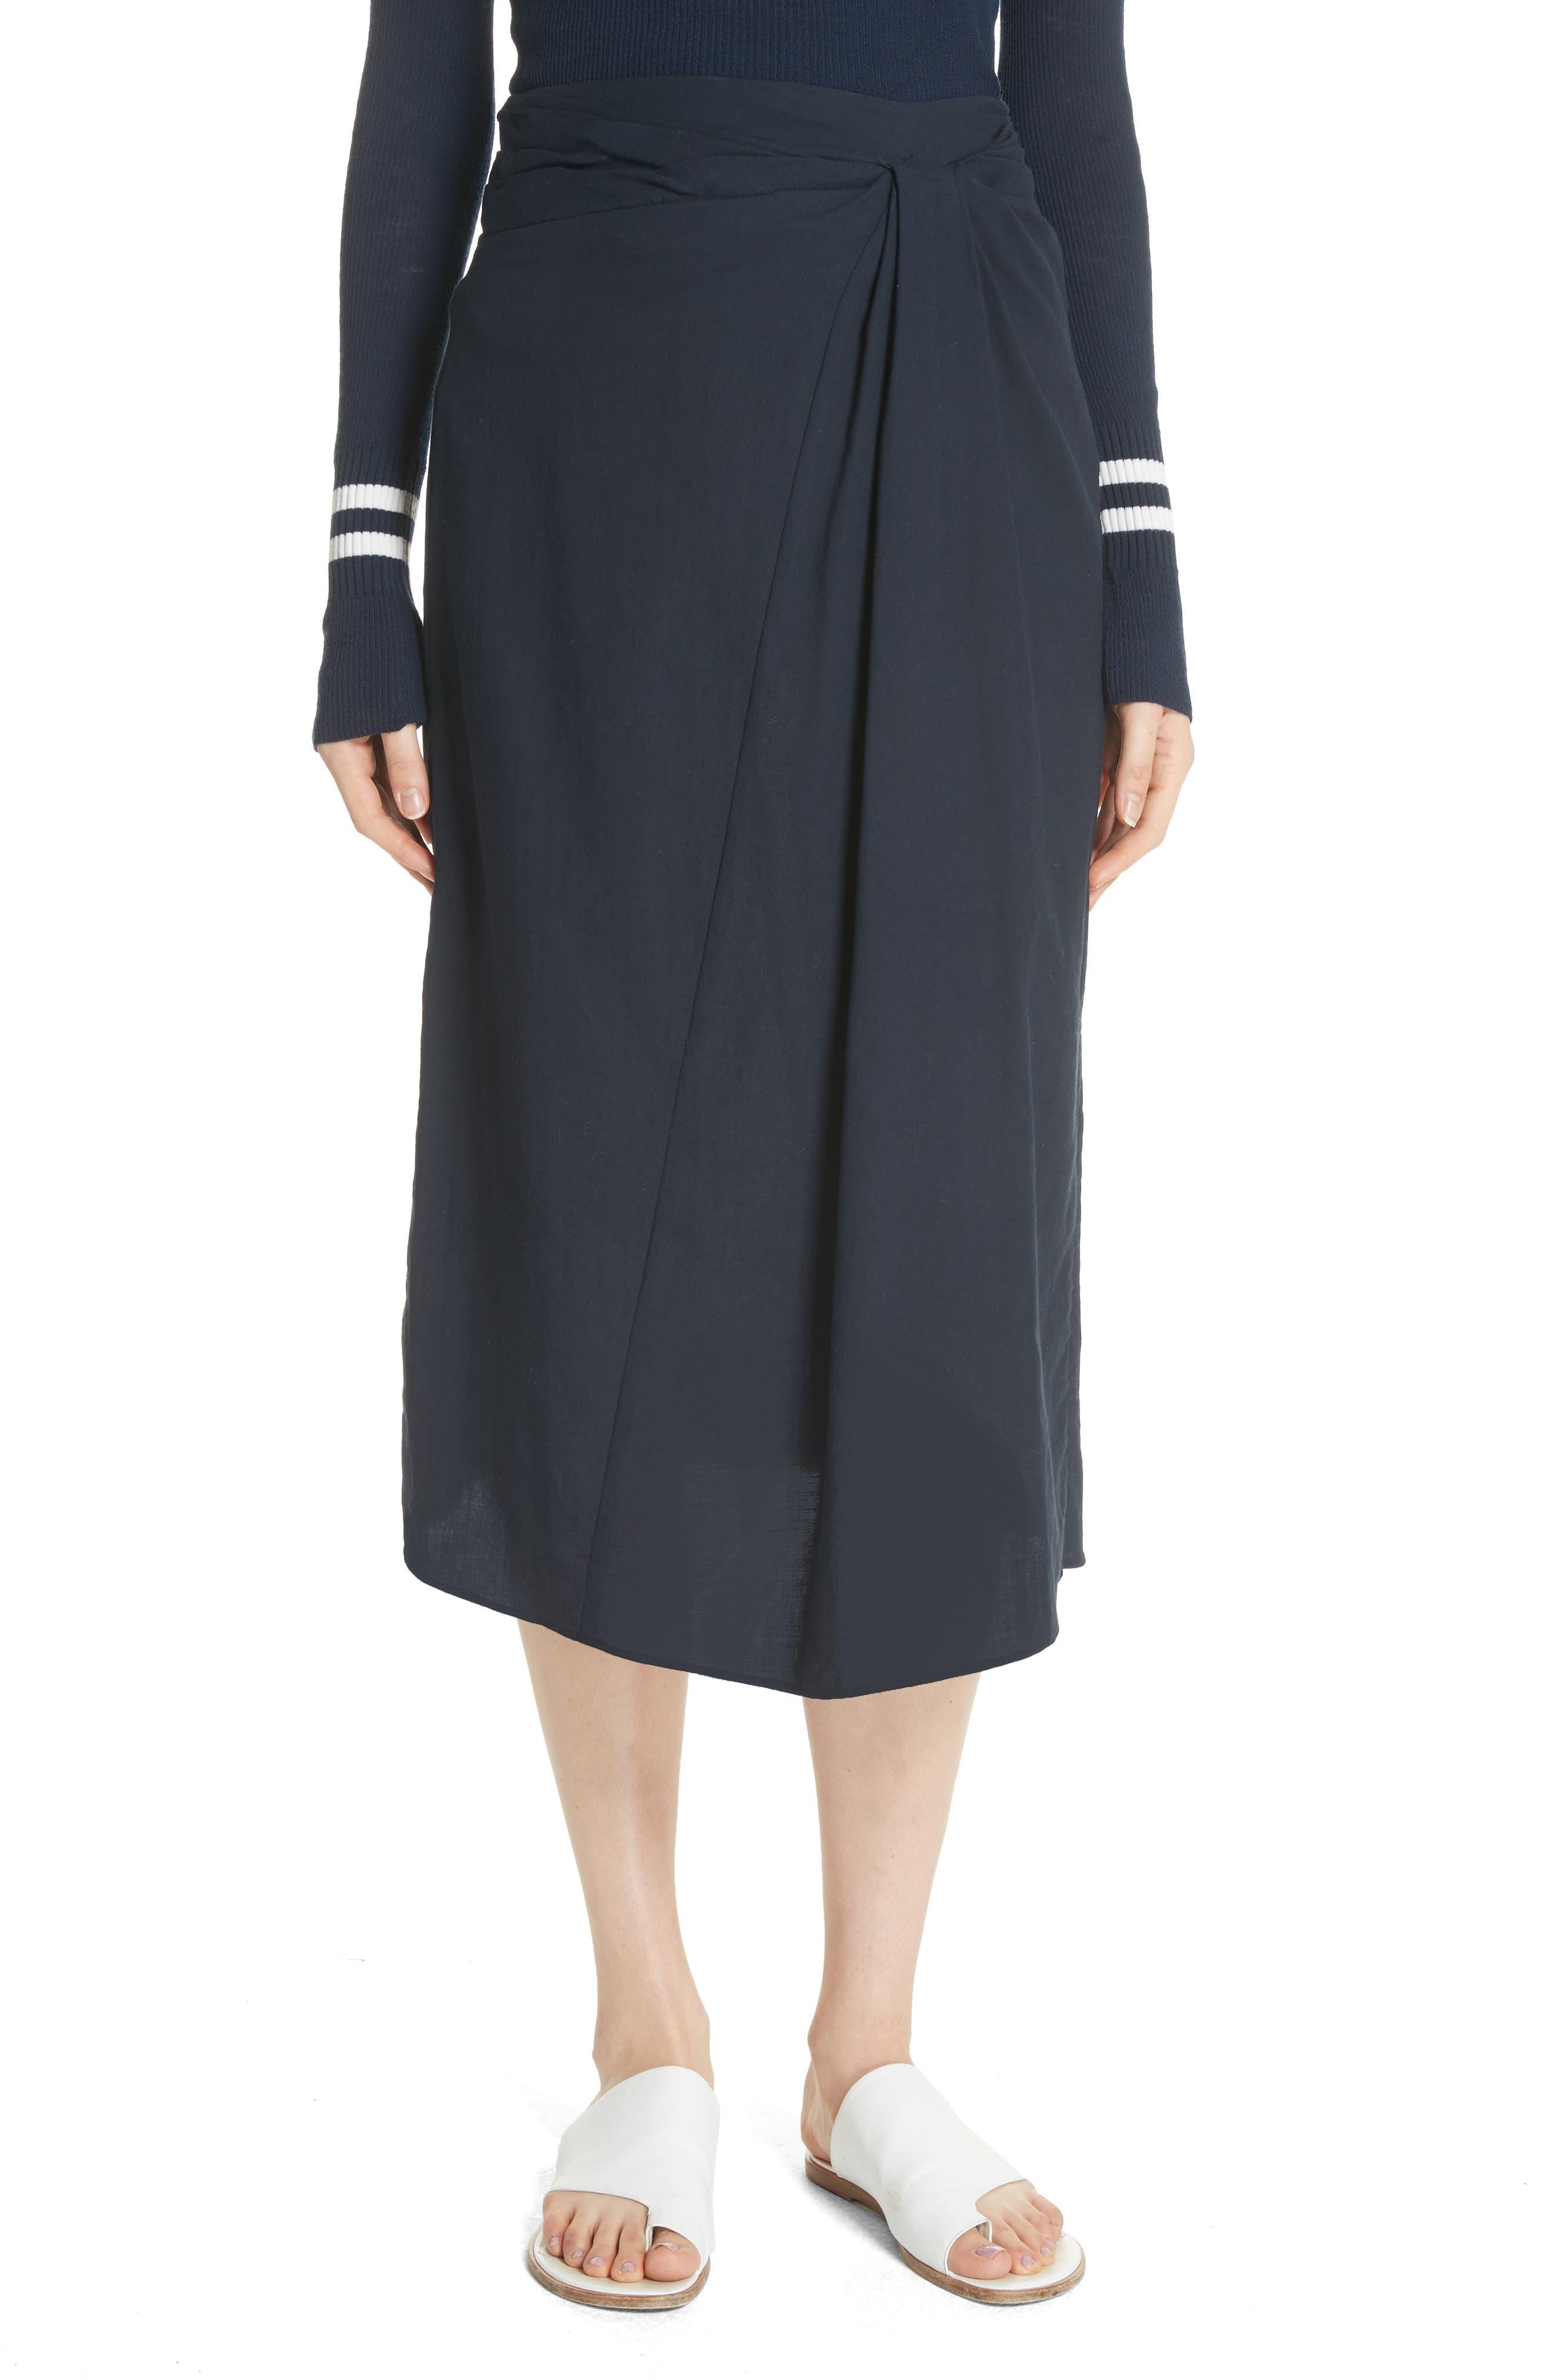 Vince Twist Detail Cotton Skirt